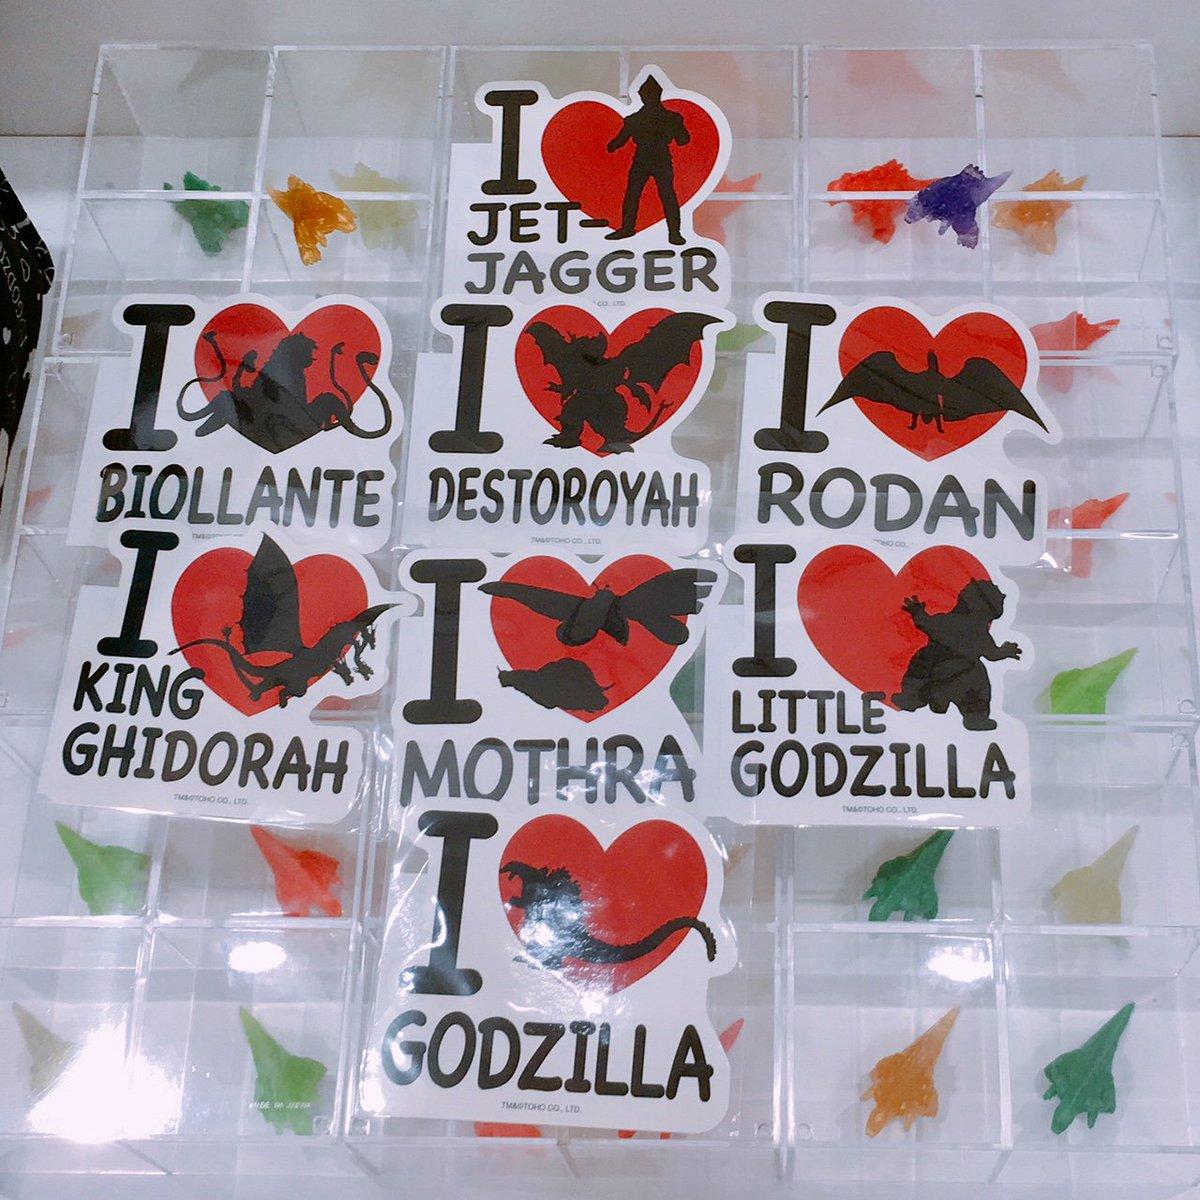 heart Mothra Exclusive from Tokyo Godzilla Store GODZILLA STICKER I Love